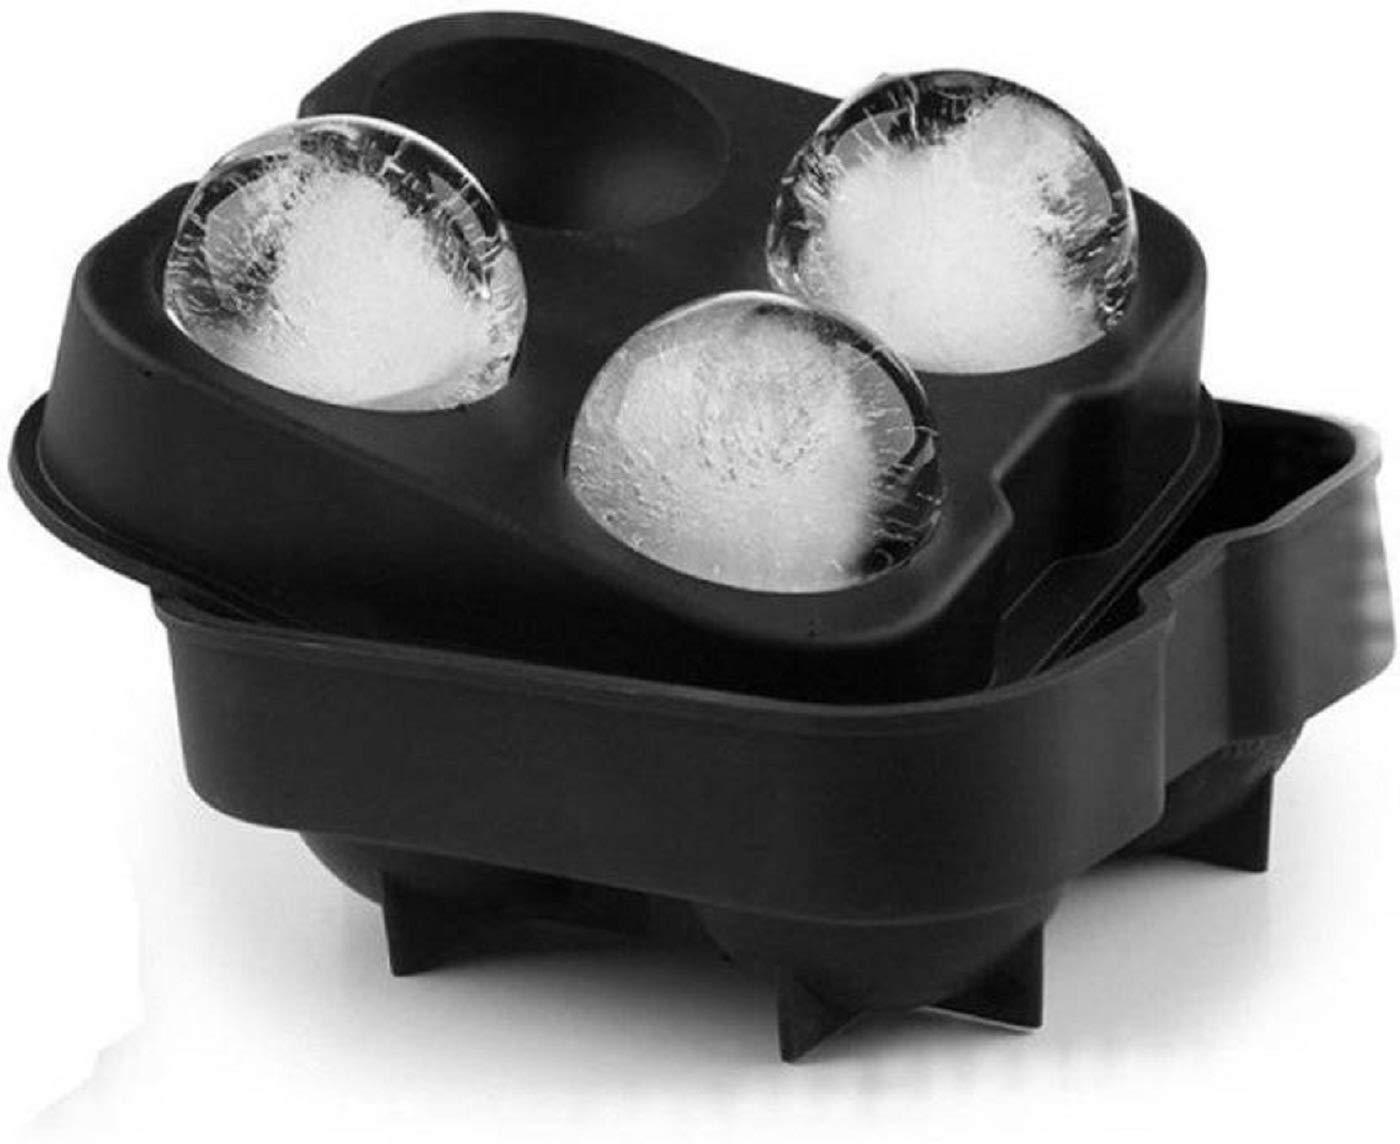 ADEPT Ice Ball Maker Food Grade Silicone Ice Moulds Makes 4 X 4.5 cm Balls (B07HDCPLPB) Amazon Price History, Amazon Price Tracker